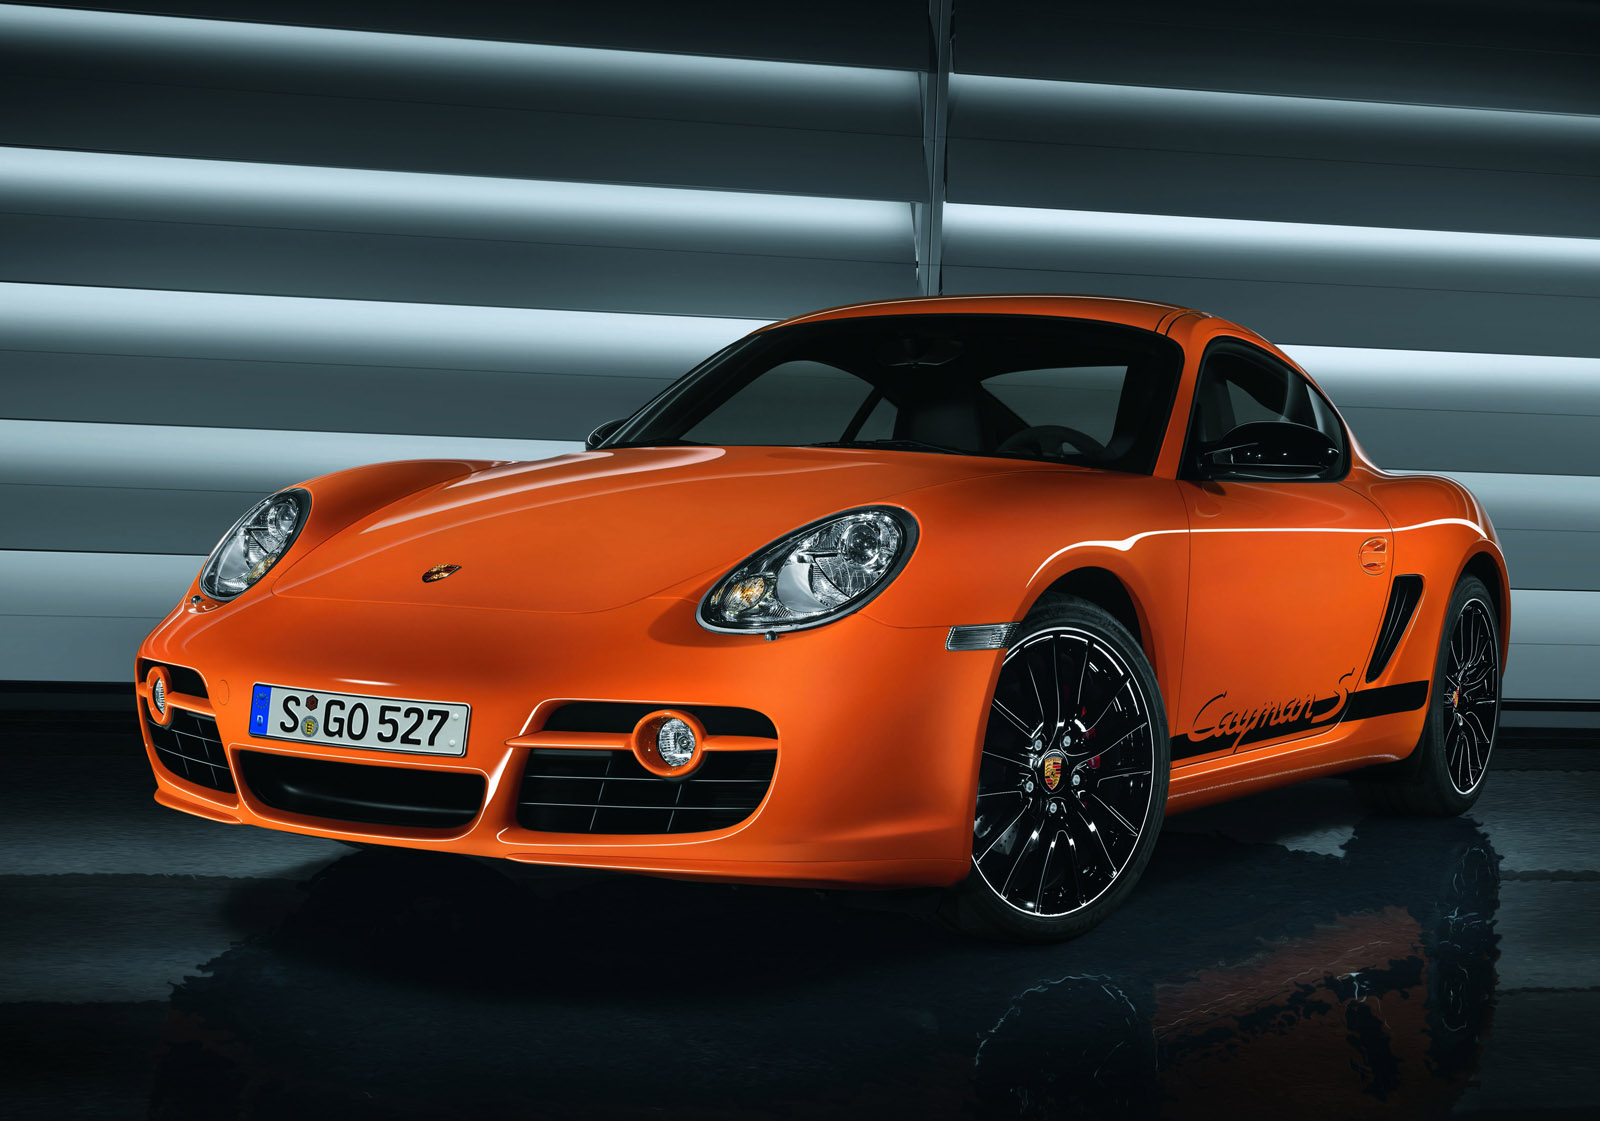 Porsche Cayman S orange Car Specifications Motorsports Wallpapers Download